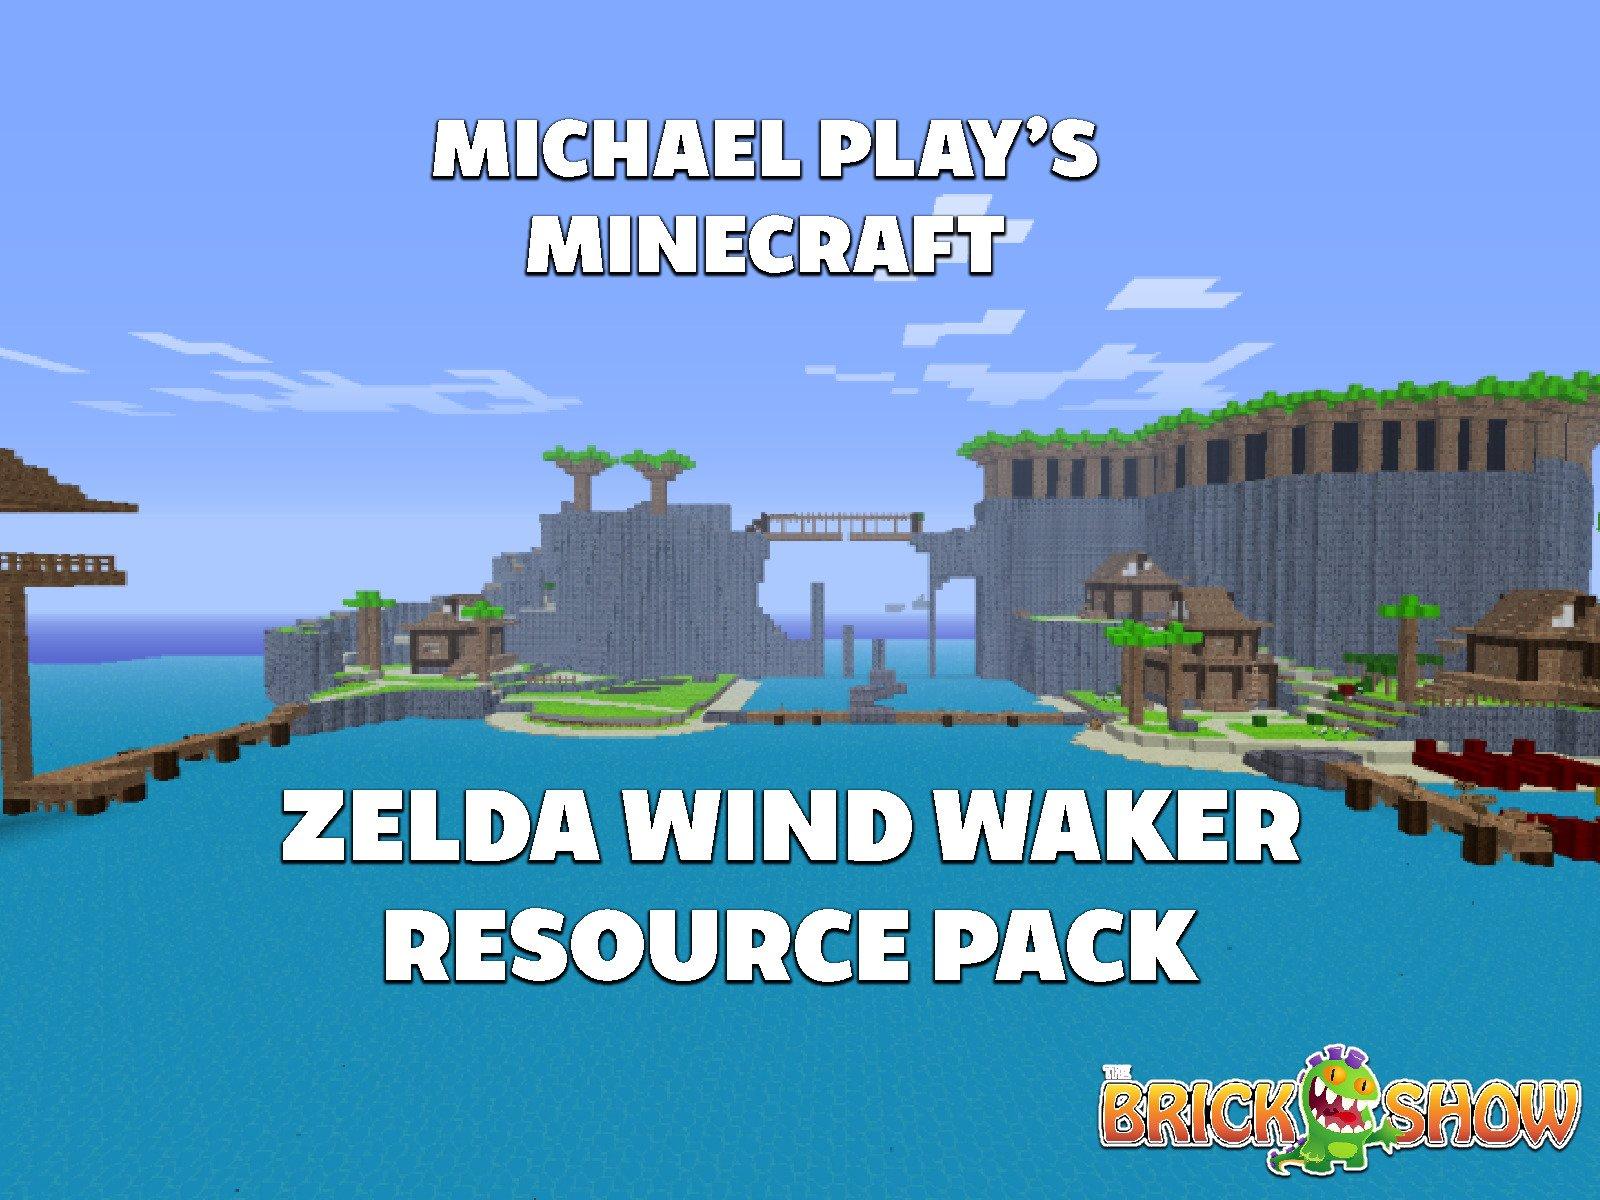 Amazon com: Watch Clip: Michael Play's Minecraft Zelda Wind Waker